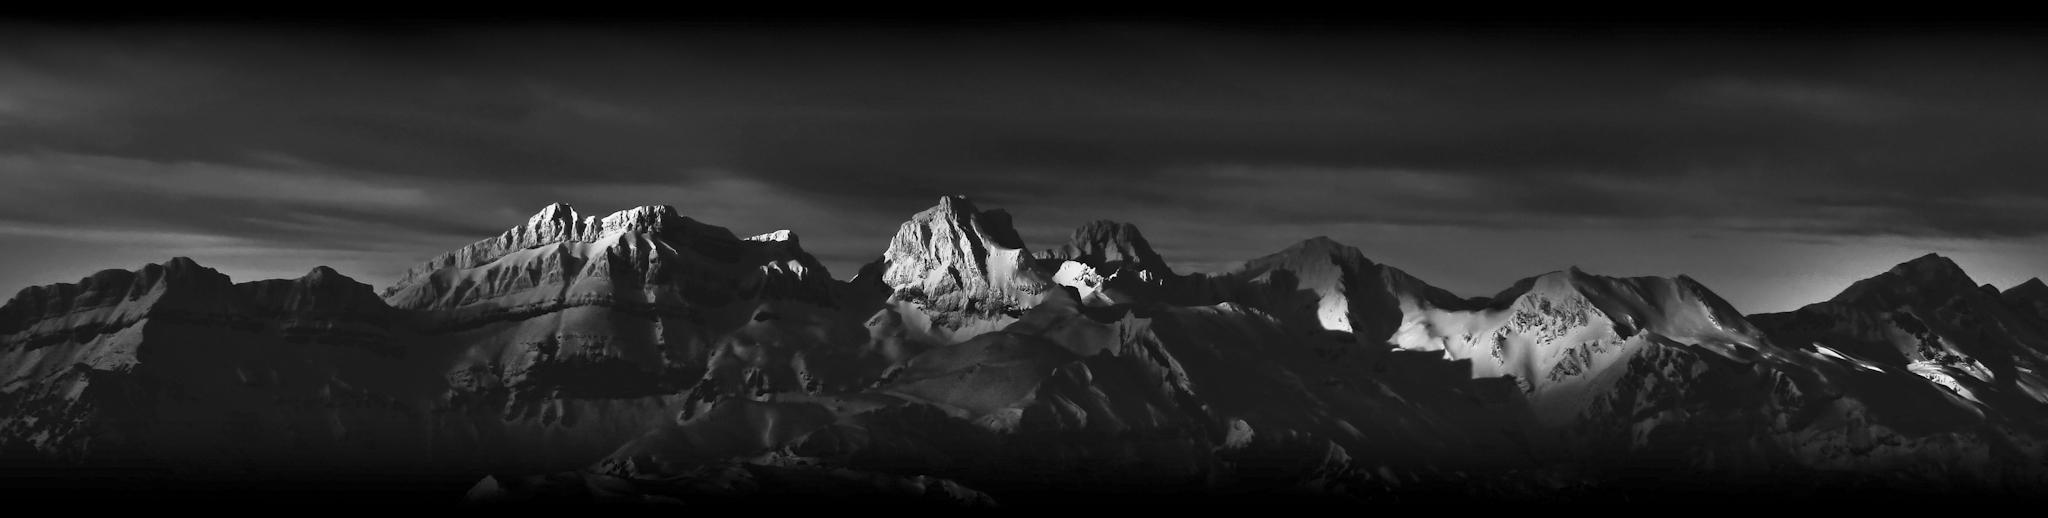 Luces de amanecer sobre el macizo del Aspe b\n - Paisajes del valle - Fotos del Valle del Aragón, Mikel Besga